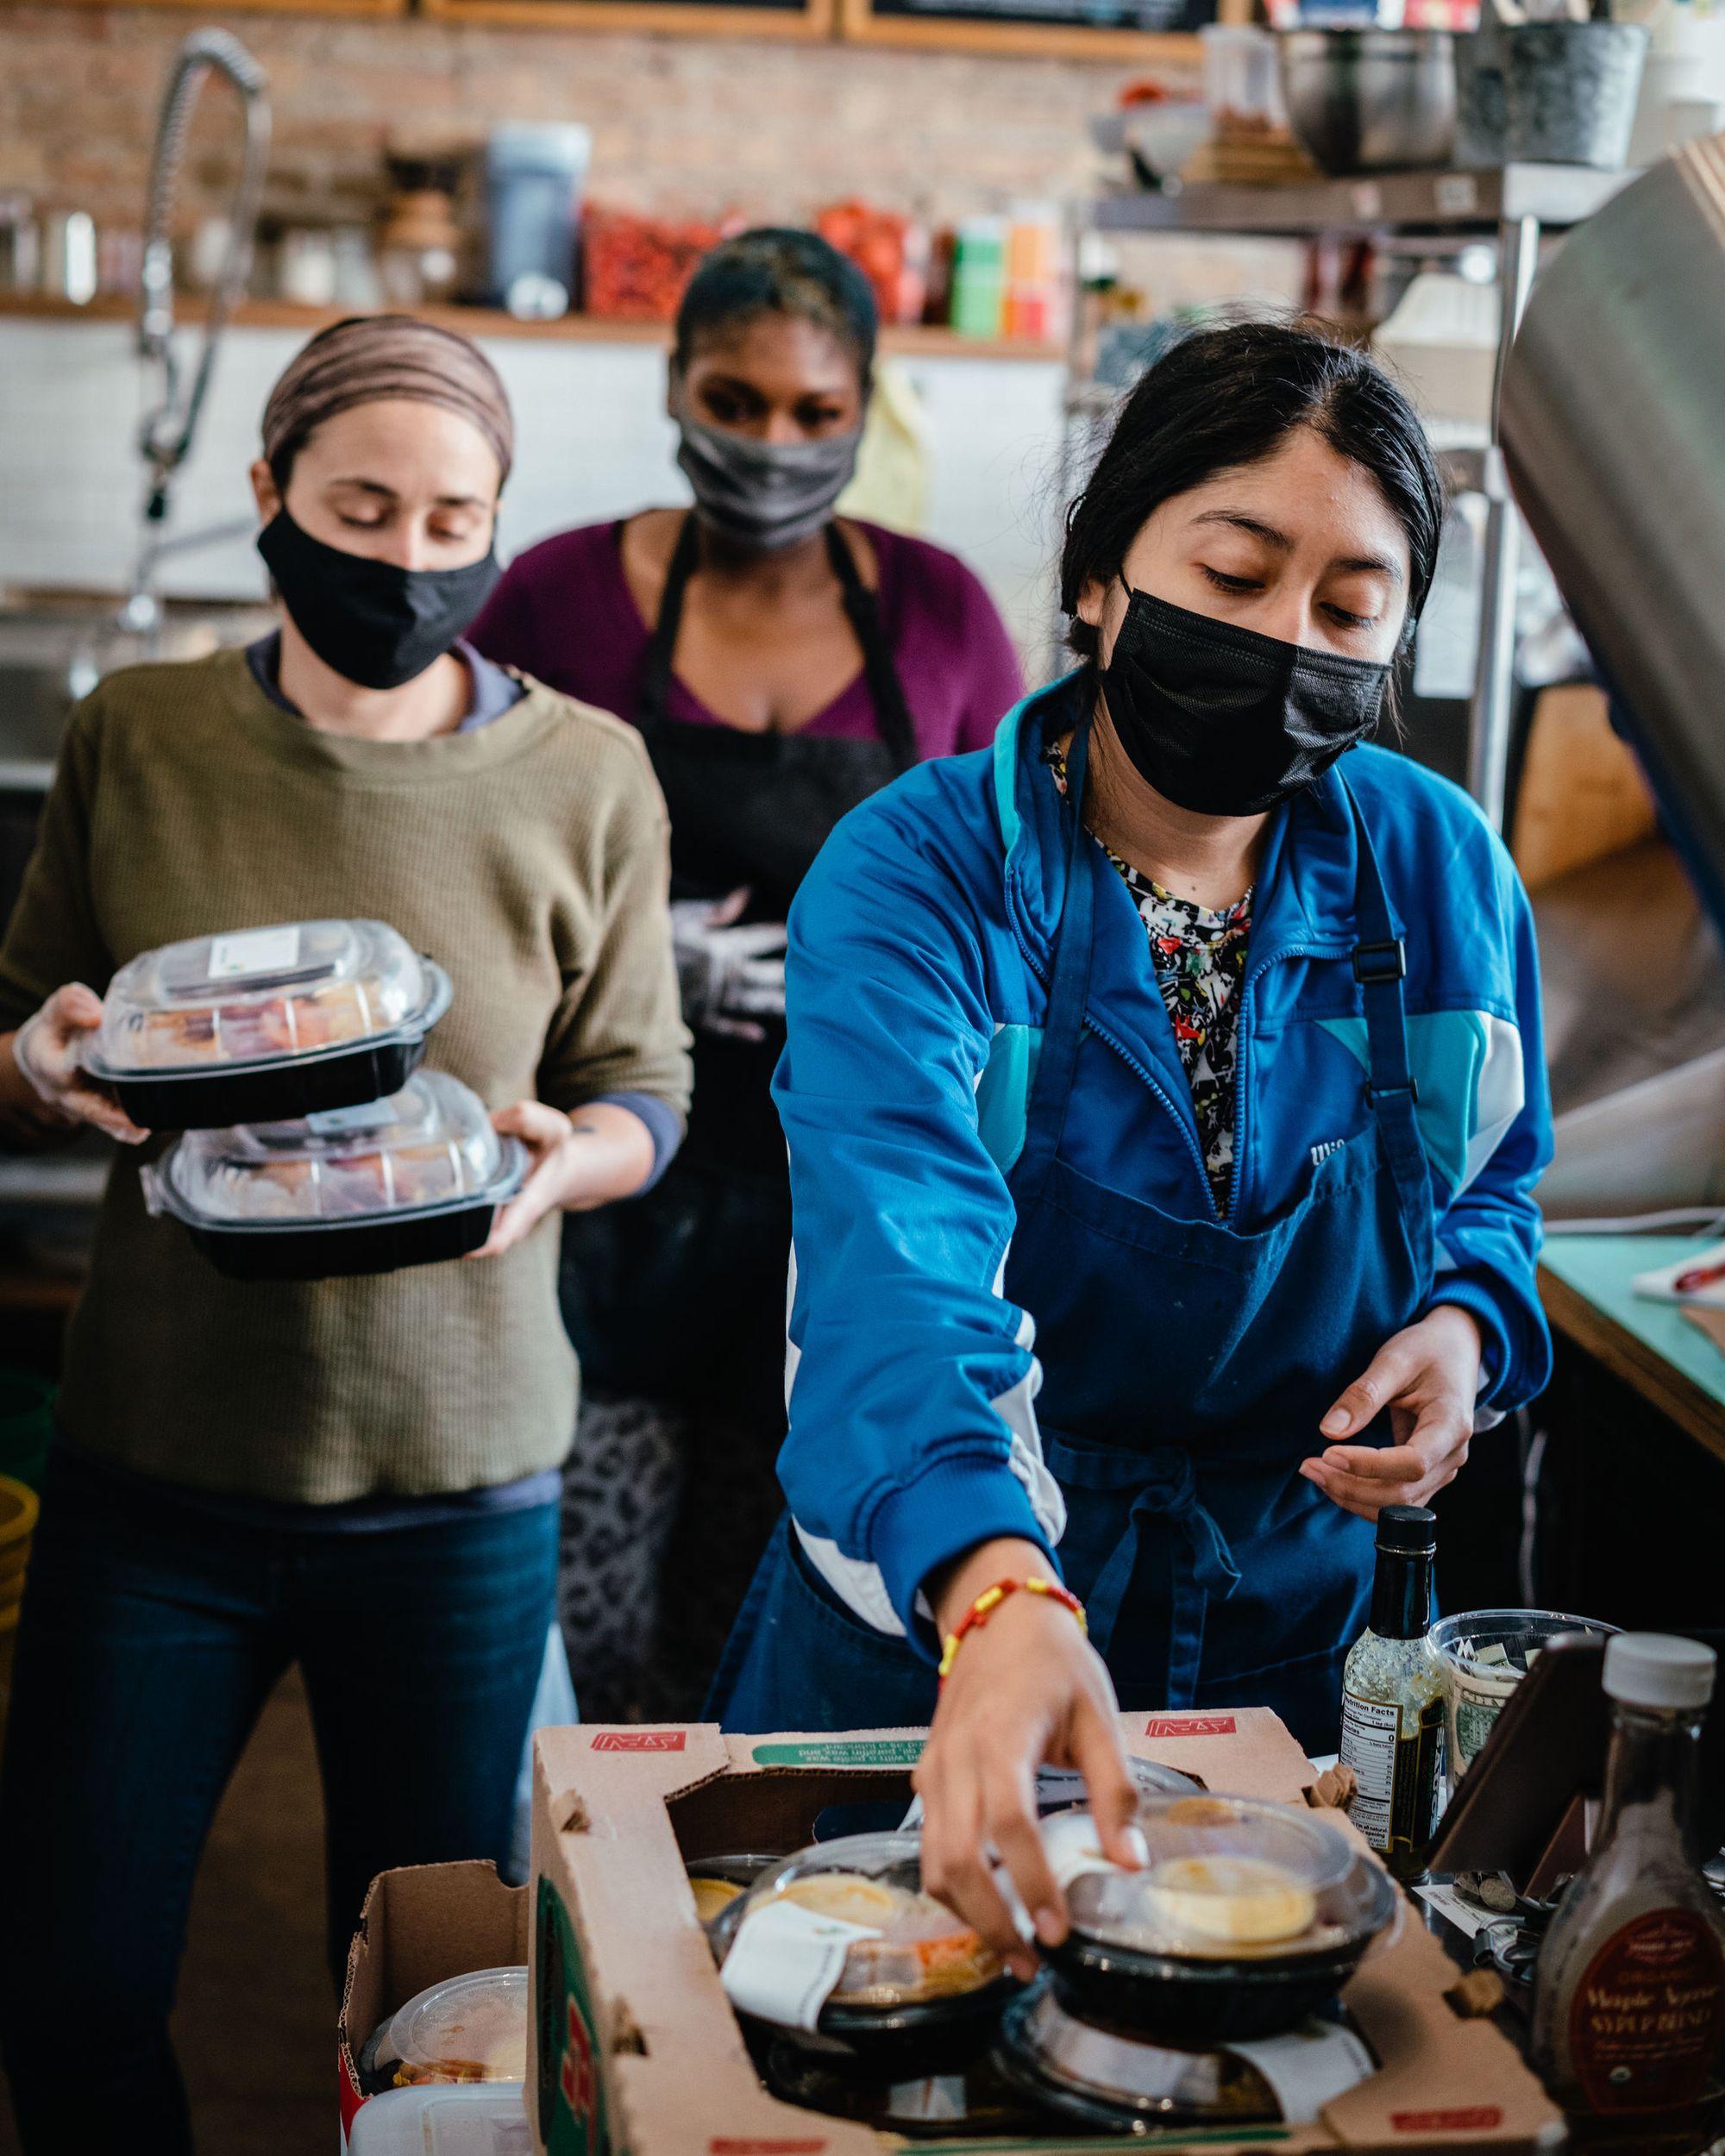 The Love Fridge - Full Circle: Q&A with Alexandra Curatolo/Chef Kymber Steward